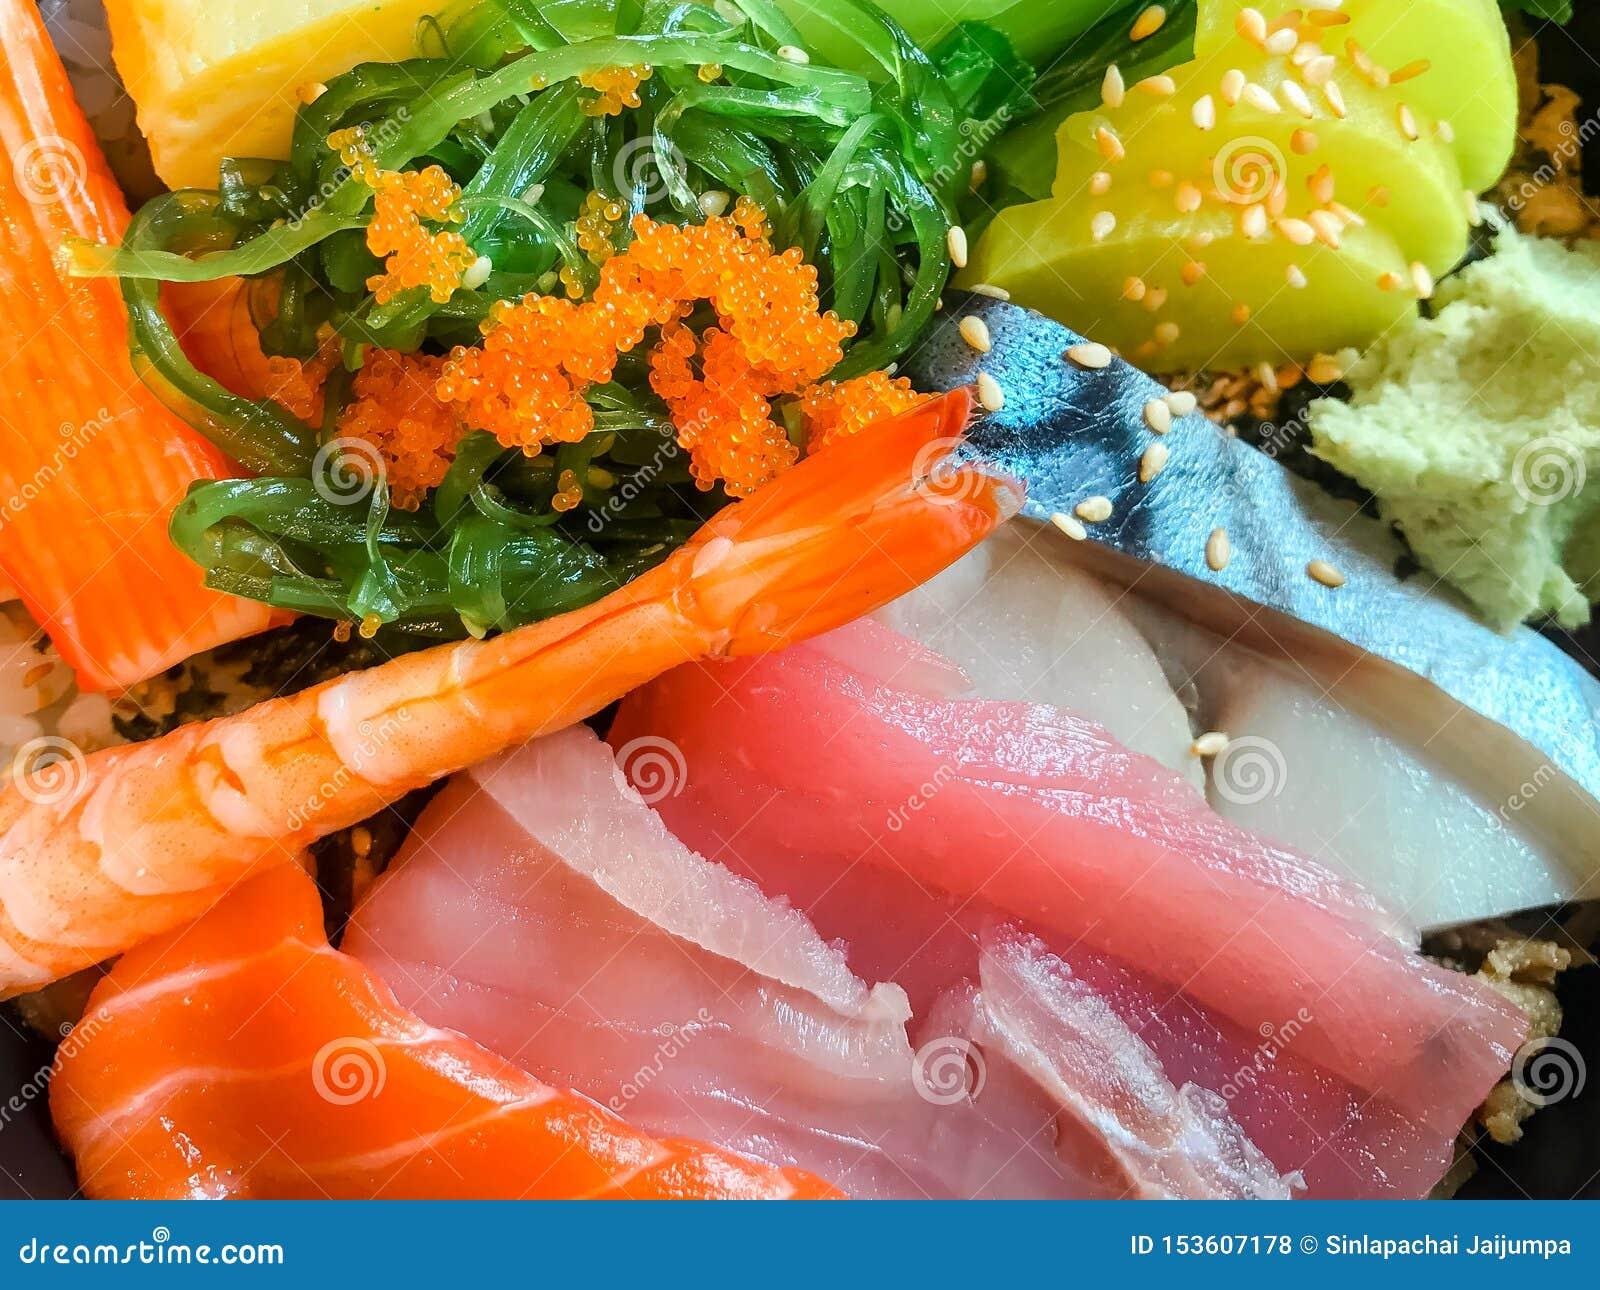 Japanese food sashimi. Mixed sliced raw fish set. Salmon fish, Tuna fish, Saba fish, Salmon roe, Crab sticks, Tamago sushi.